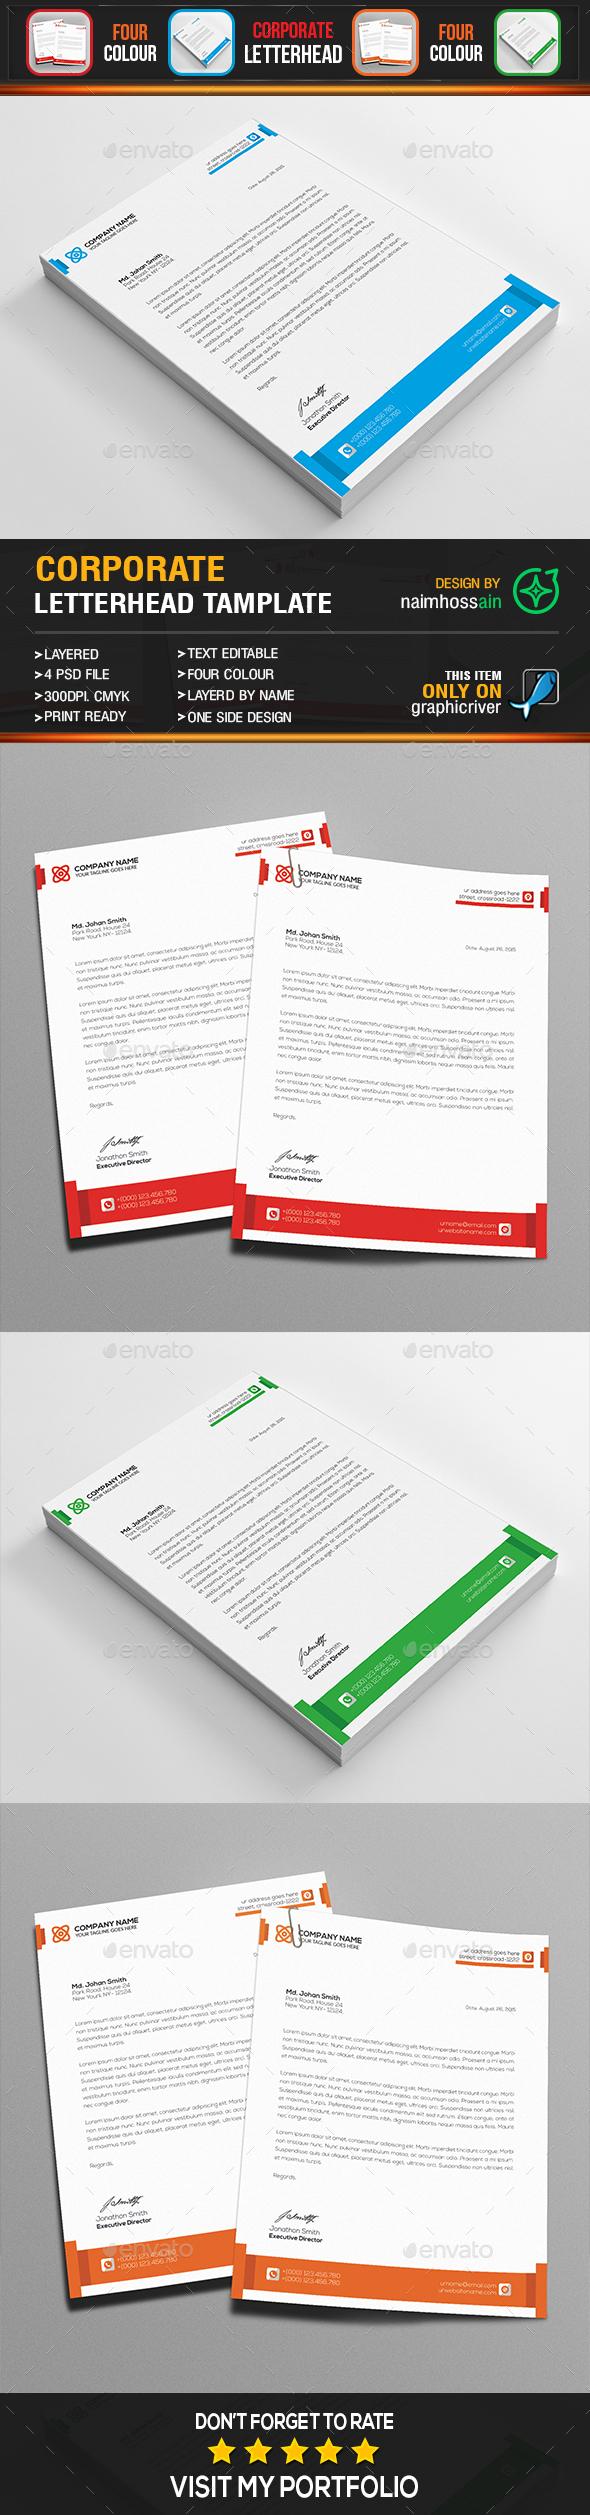 Corporate Letterhead Template - Stationery Print Templates